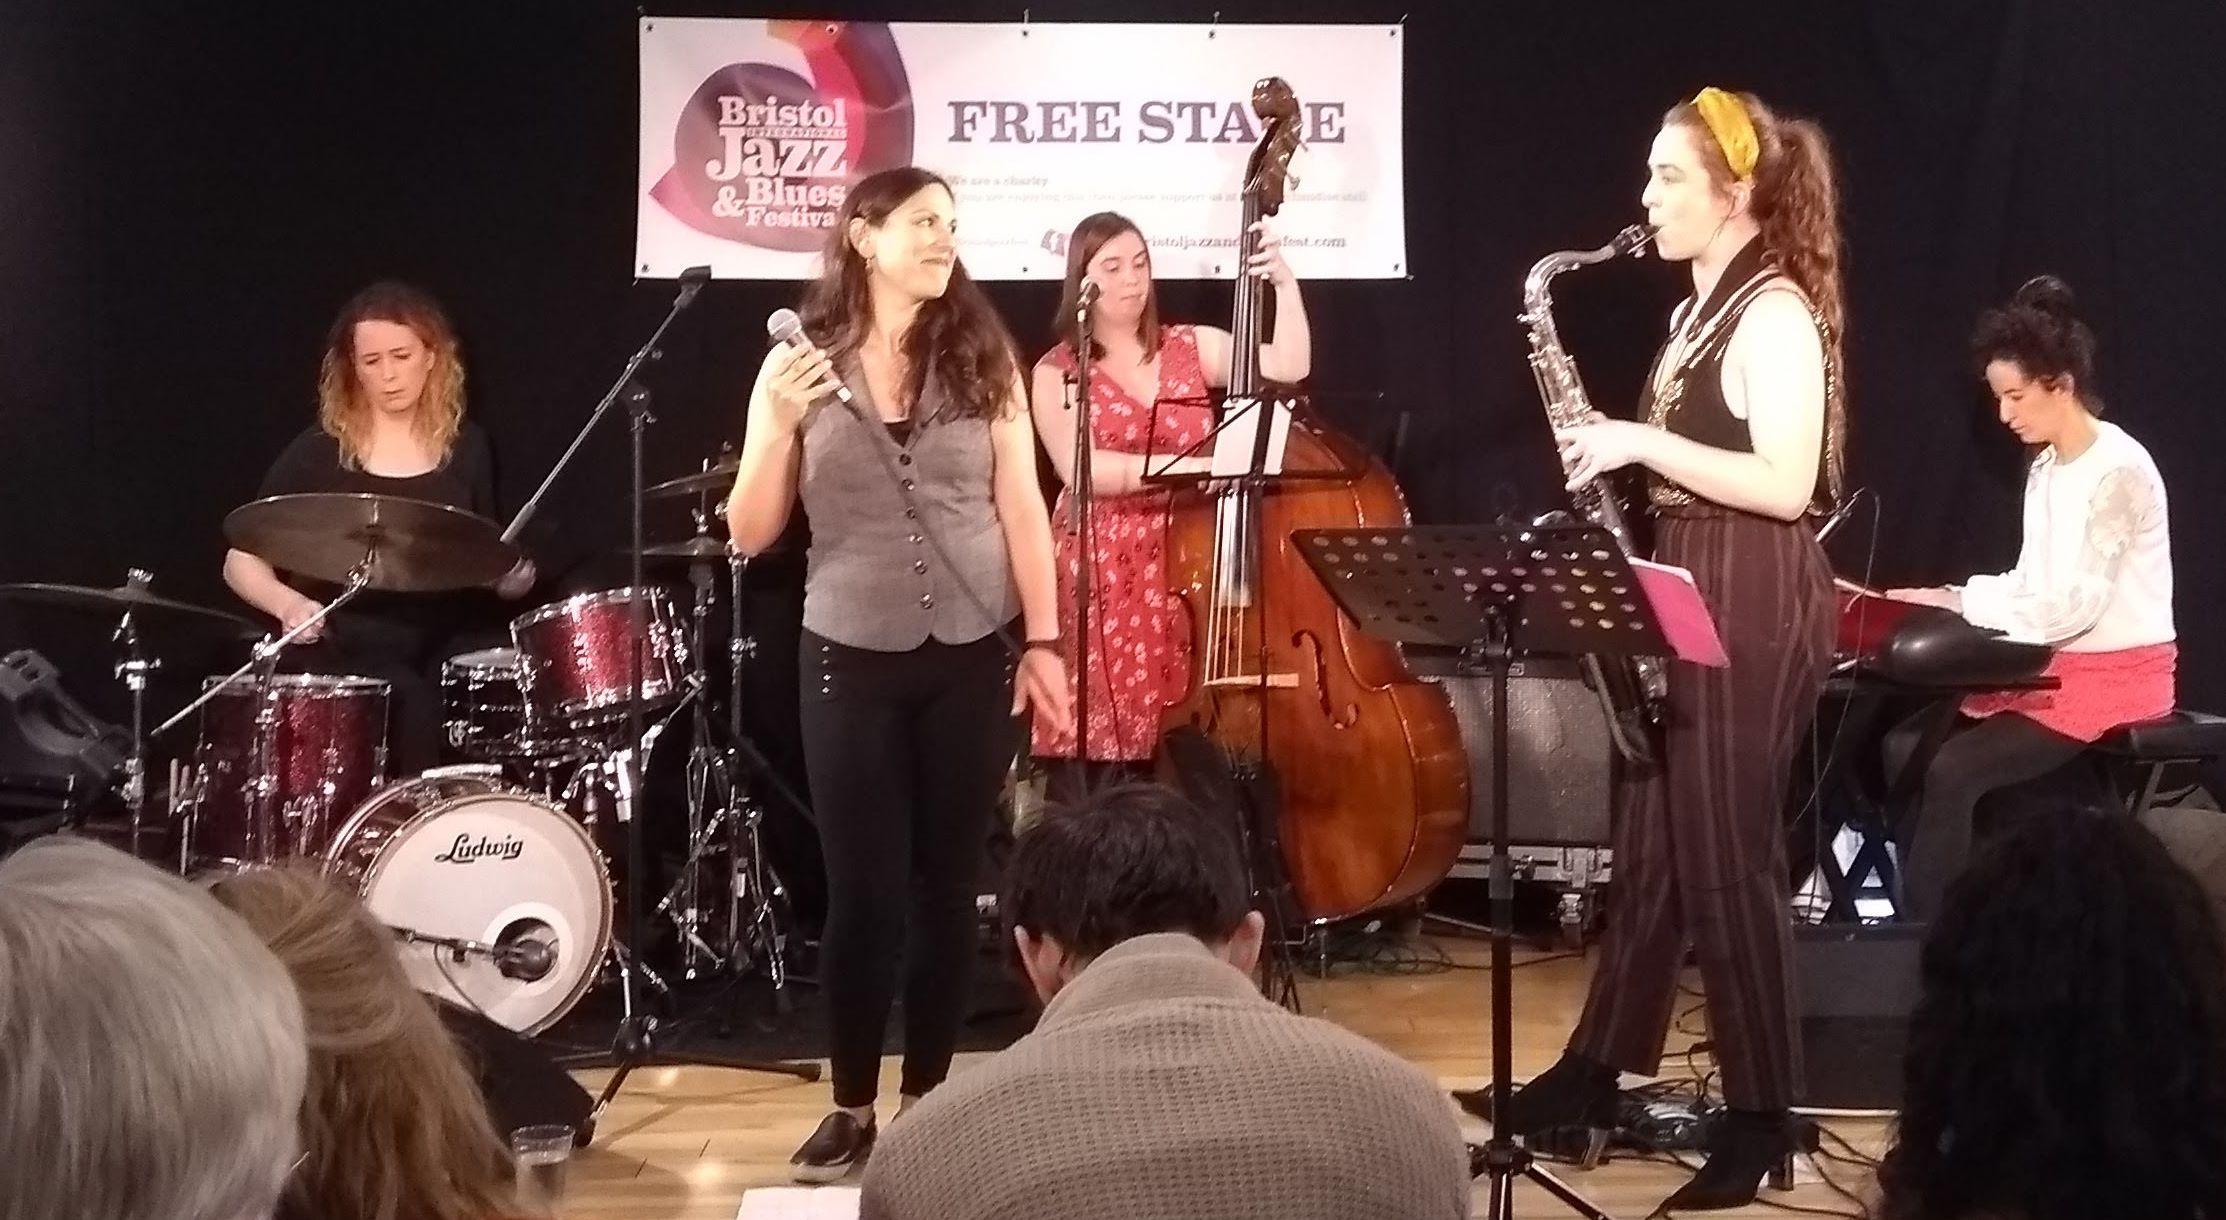 bristol jazz and blues fest.jpg